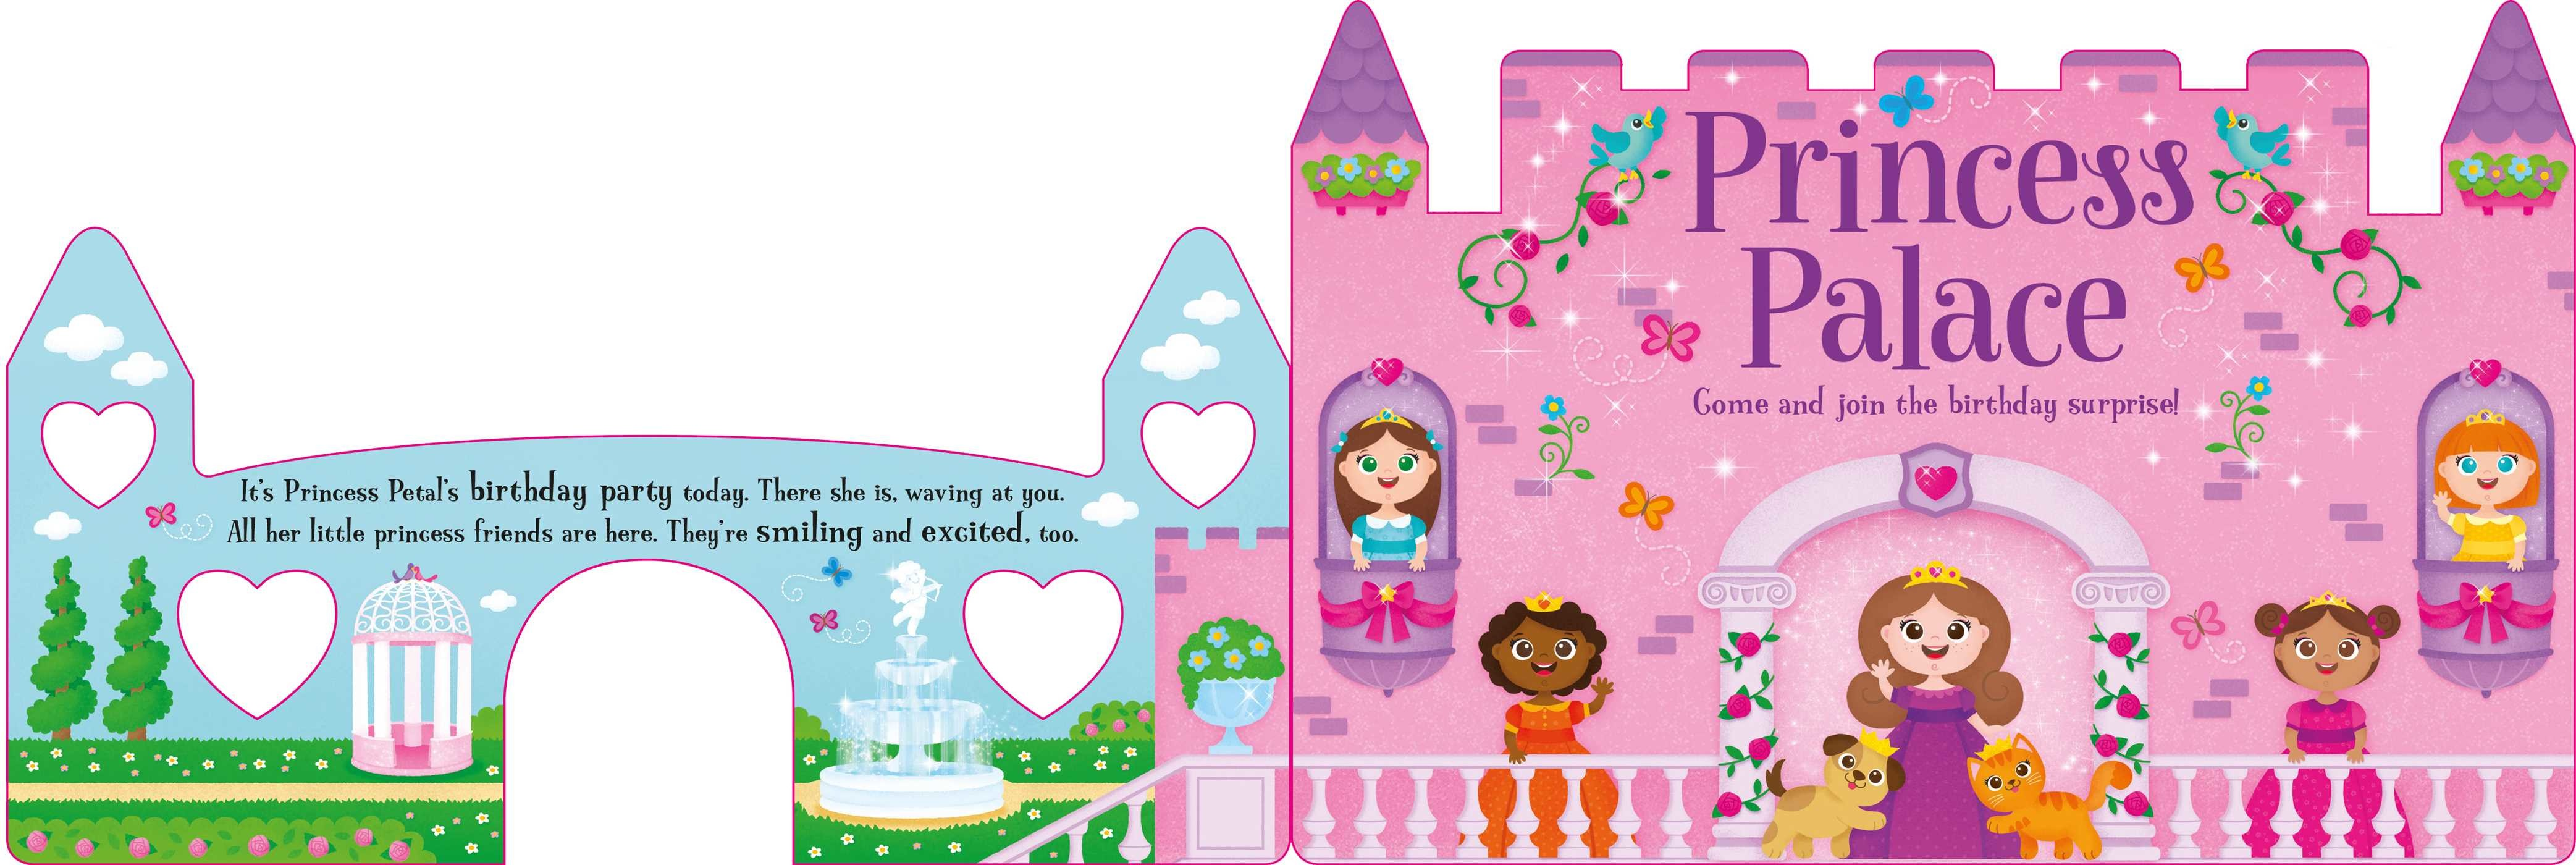 Princess palace 9781499880663.in01